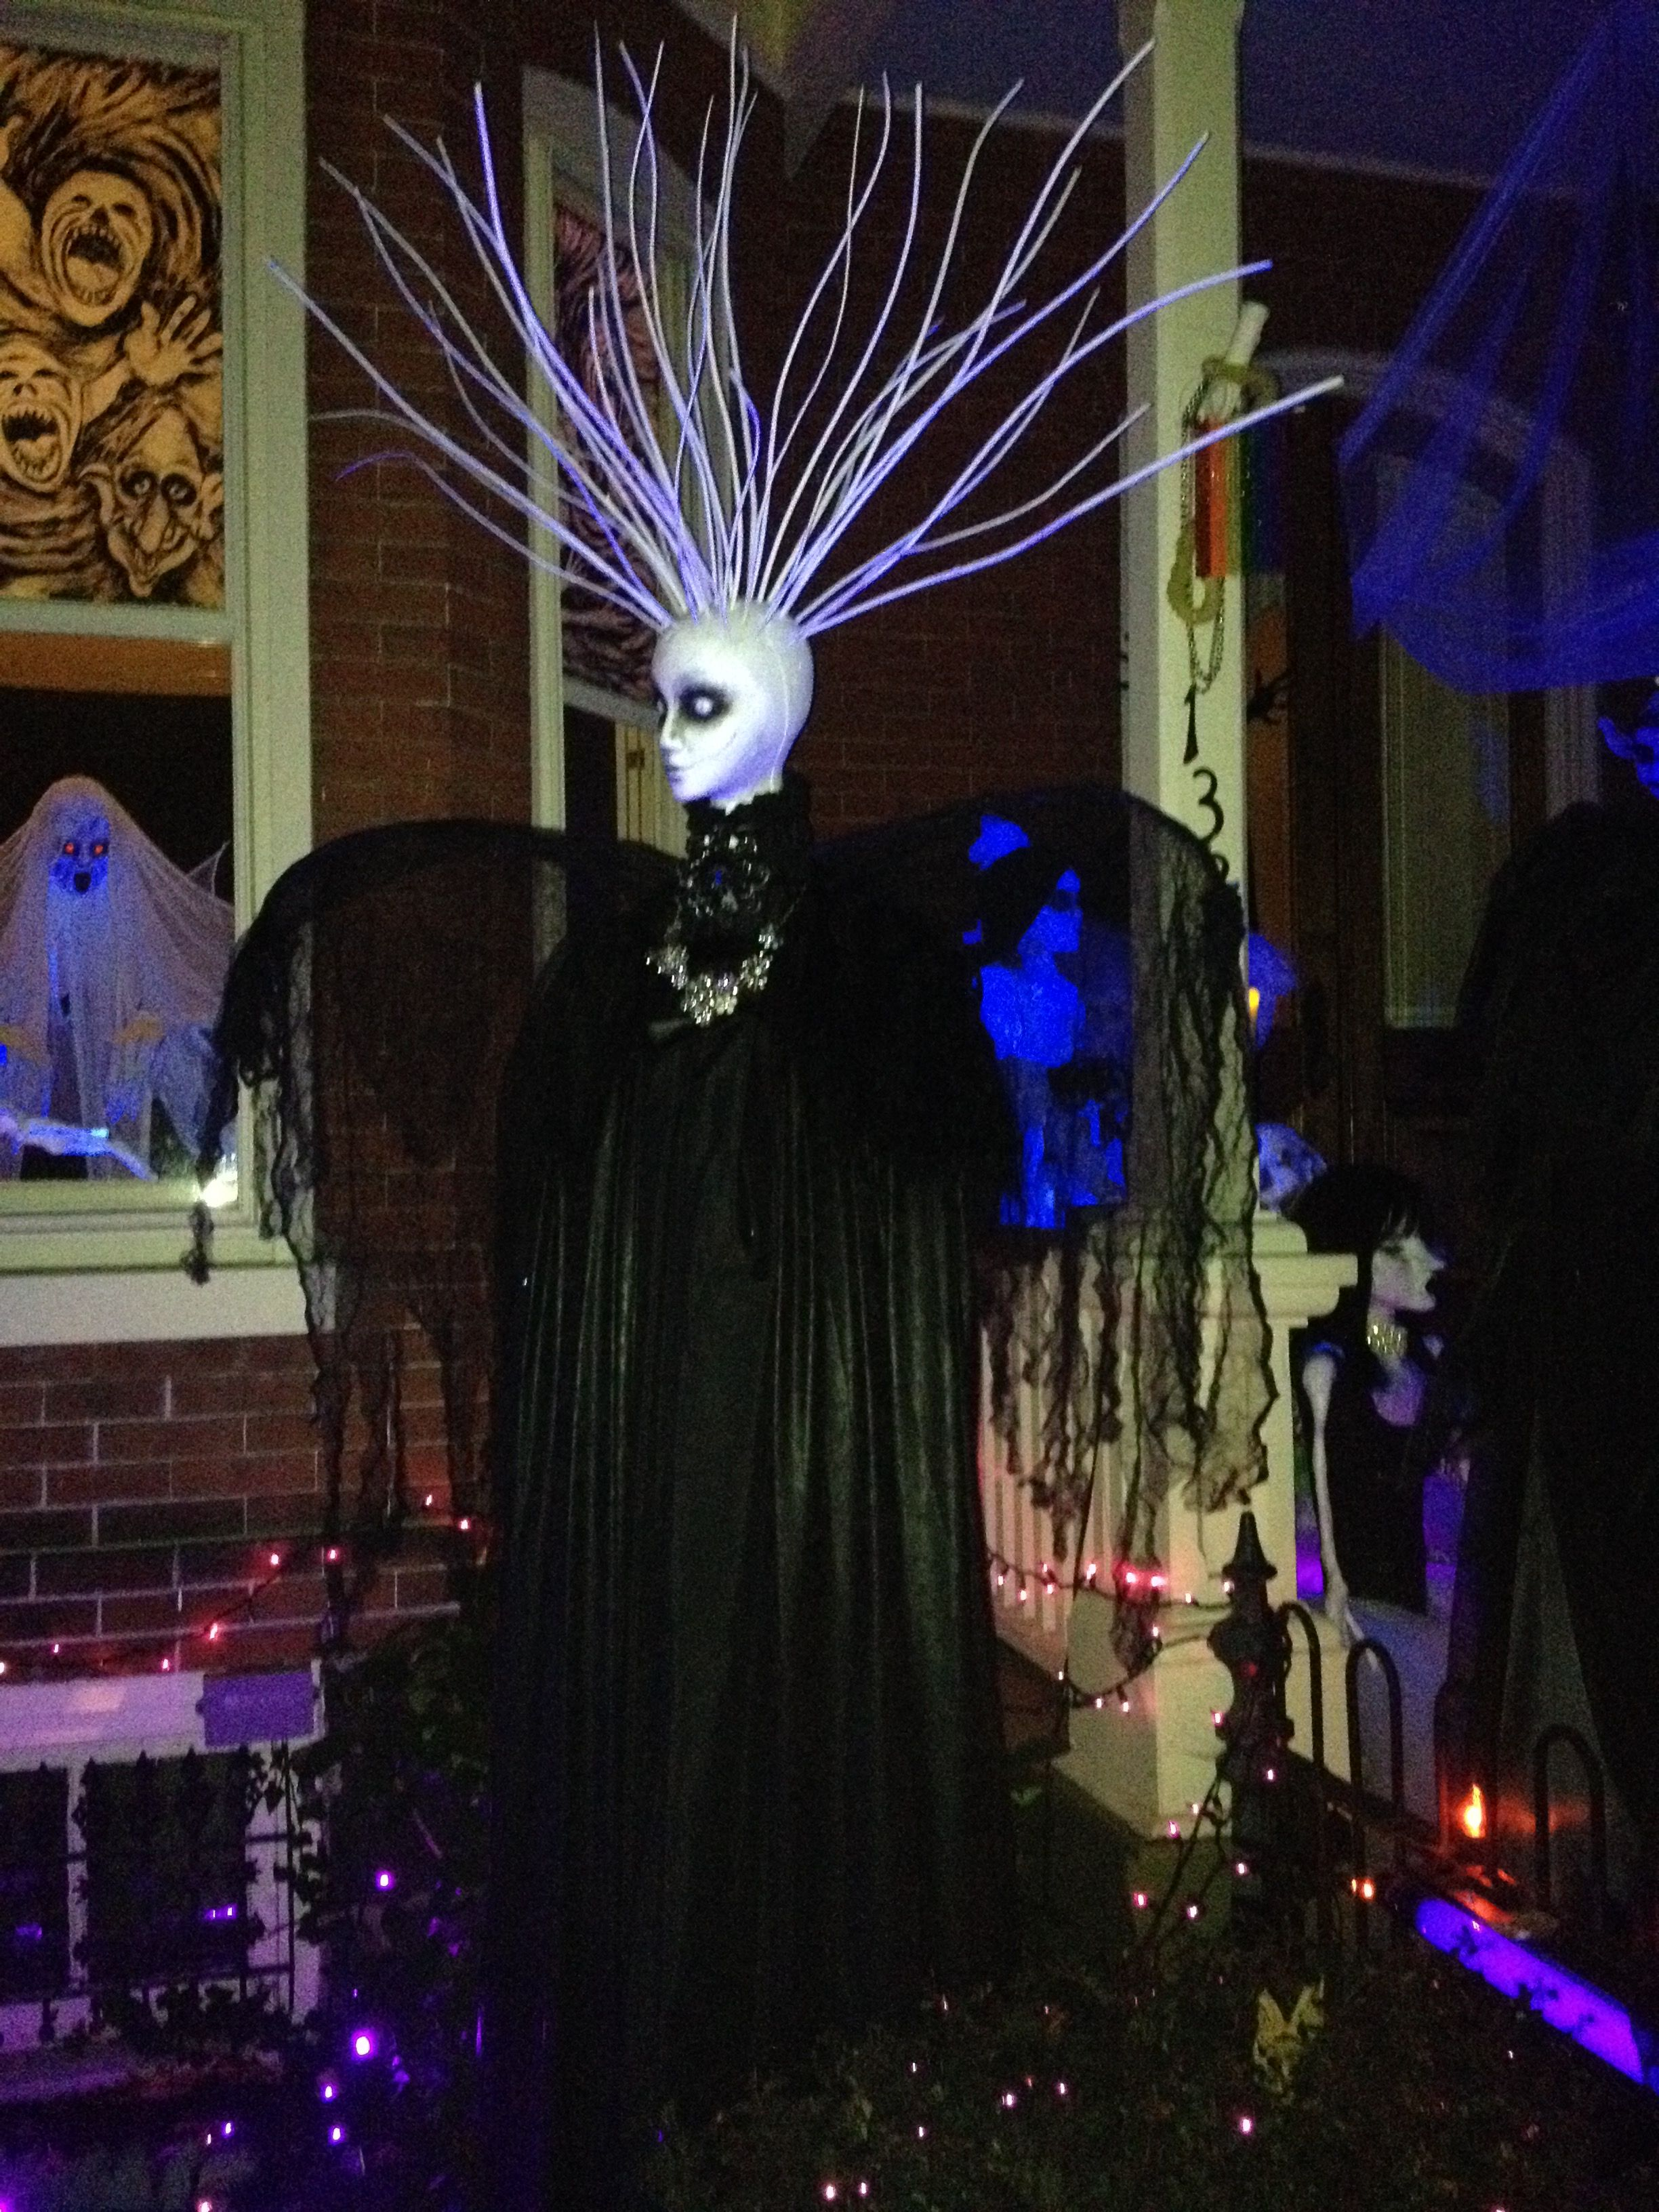 Lambertville Nj Halloween Pumpkins 2020 Lambertville, NJ | Halloween city, Halloween yard displays